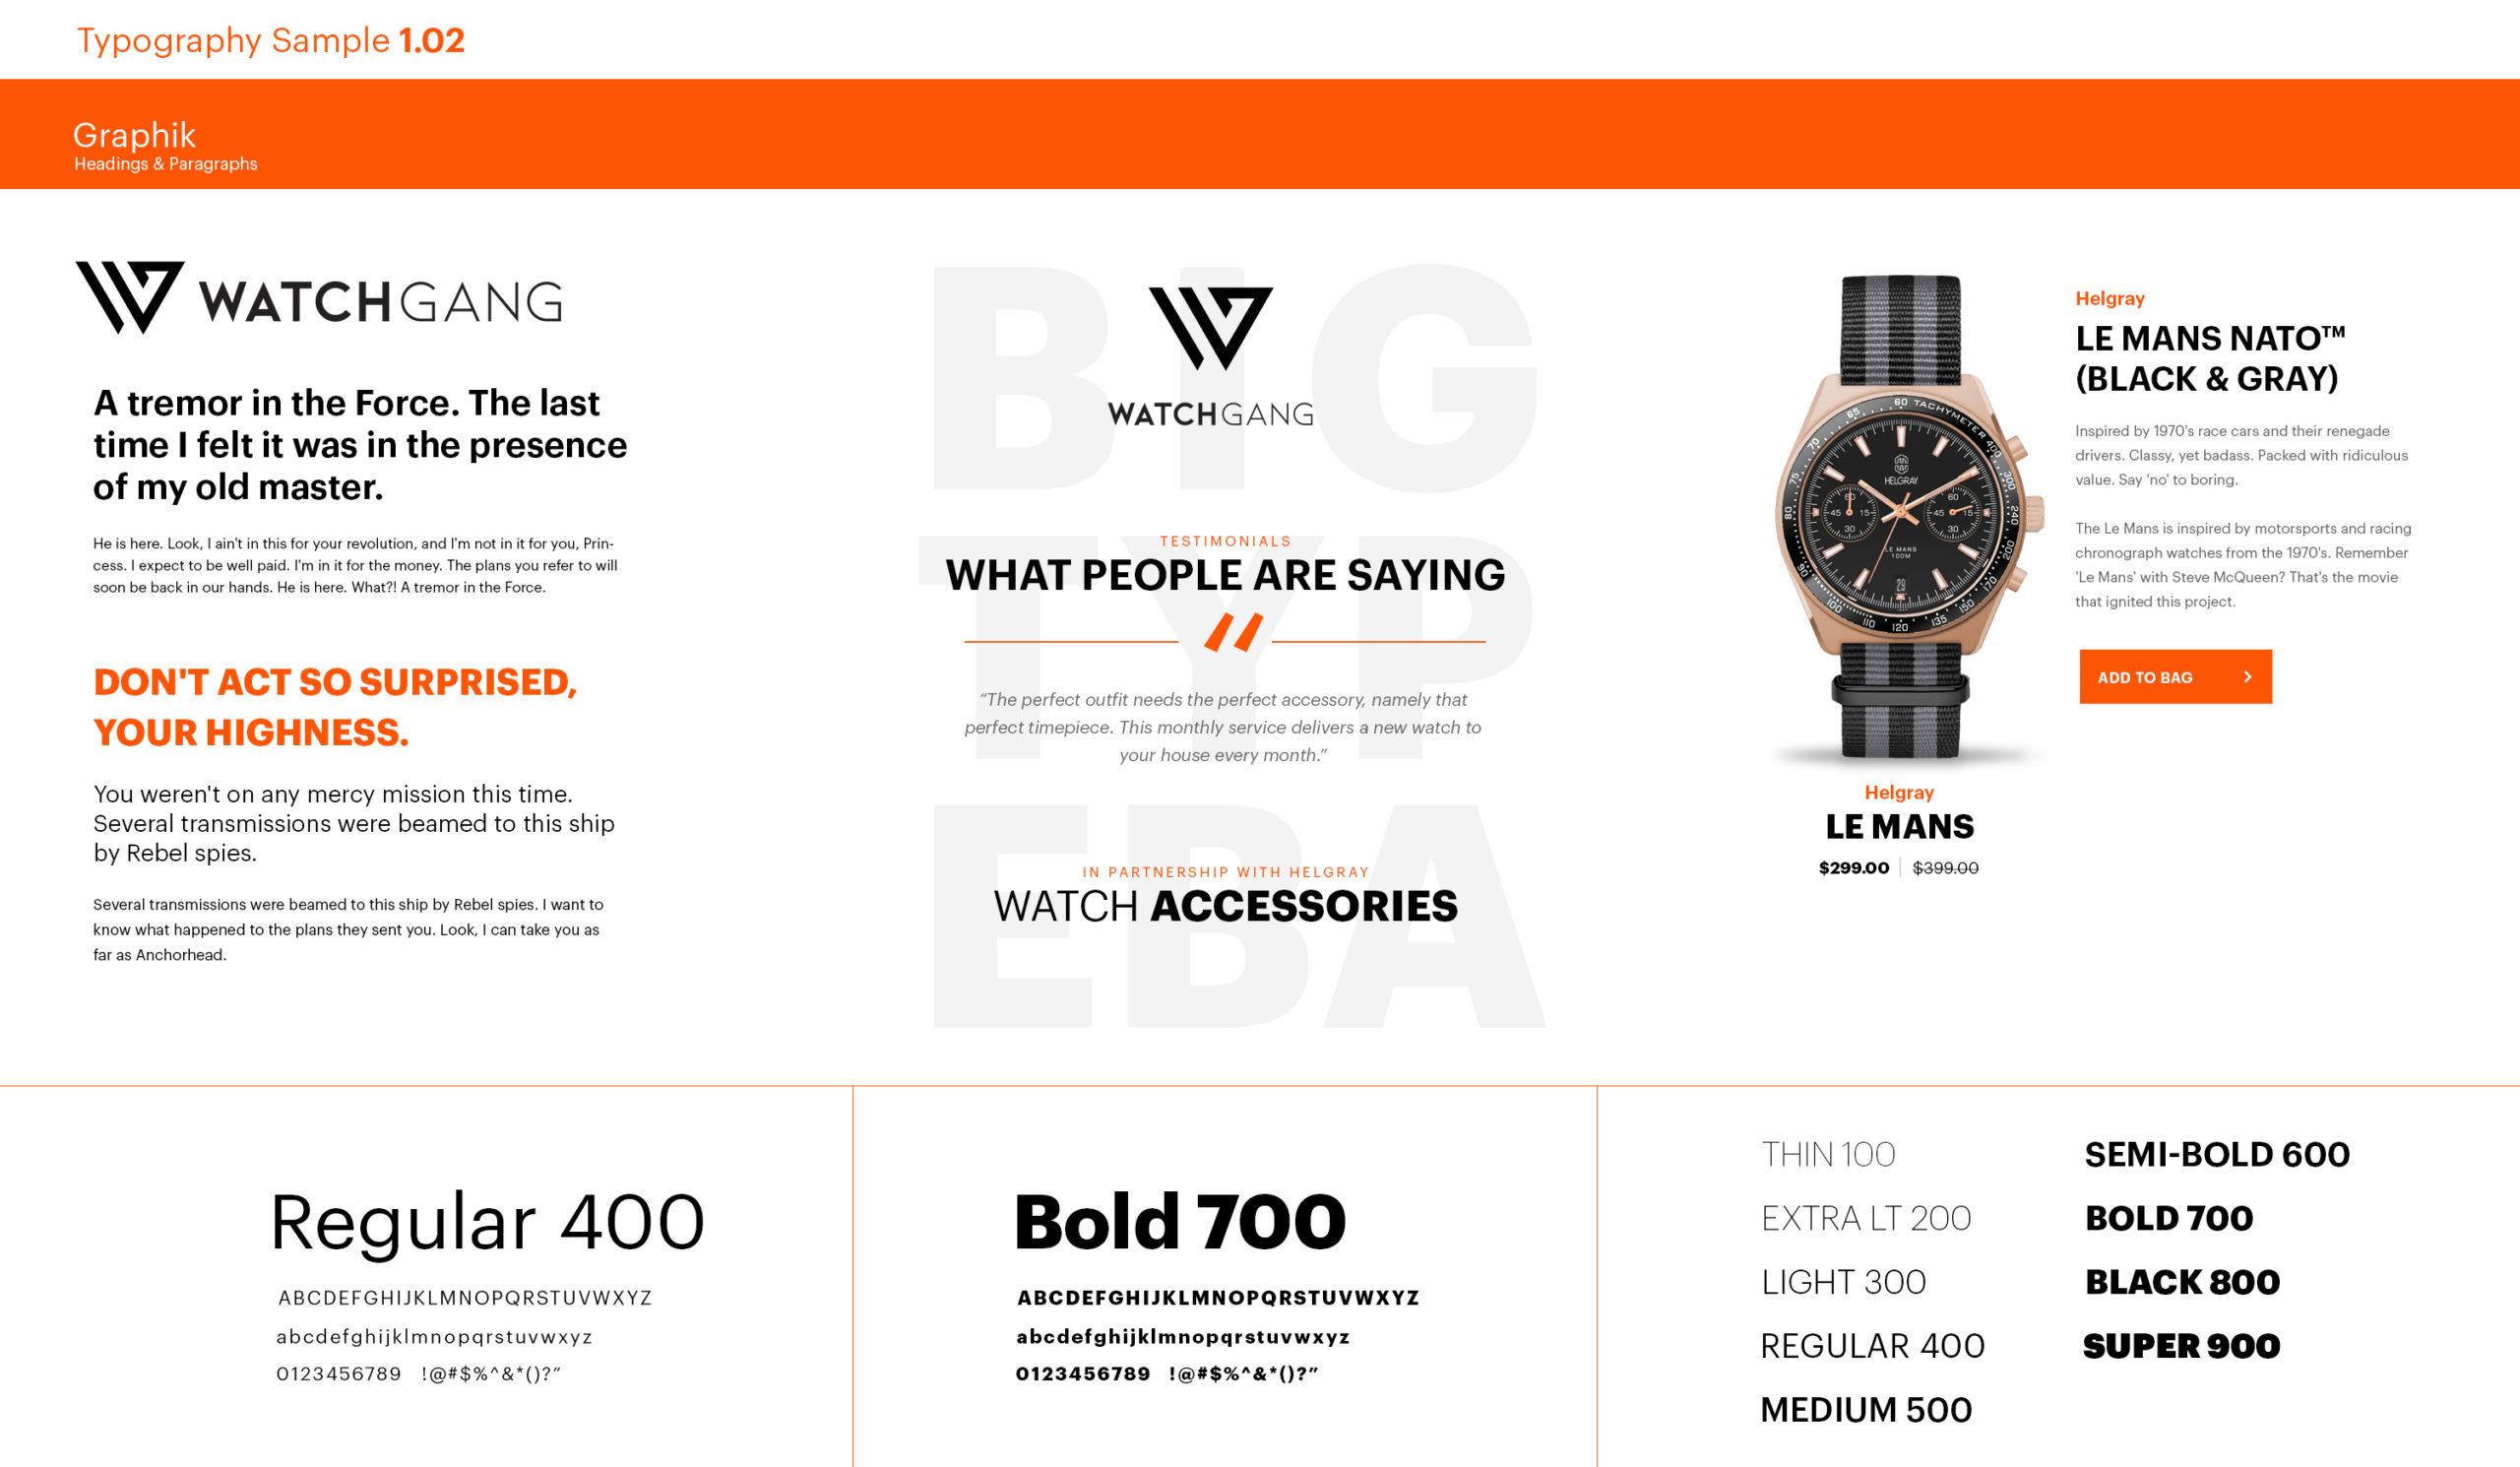 typography-sample-1.02-graphik